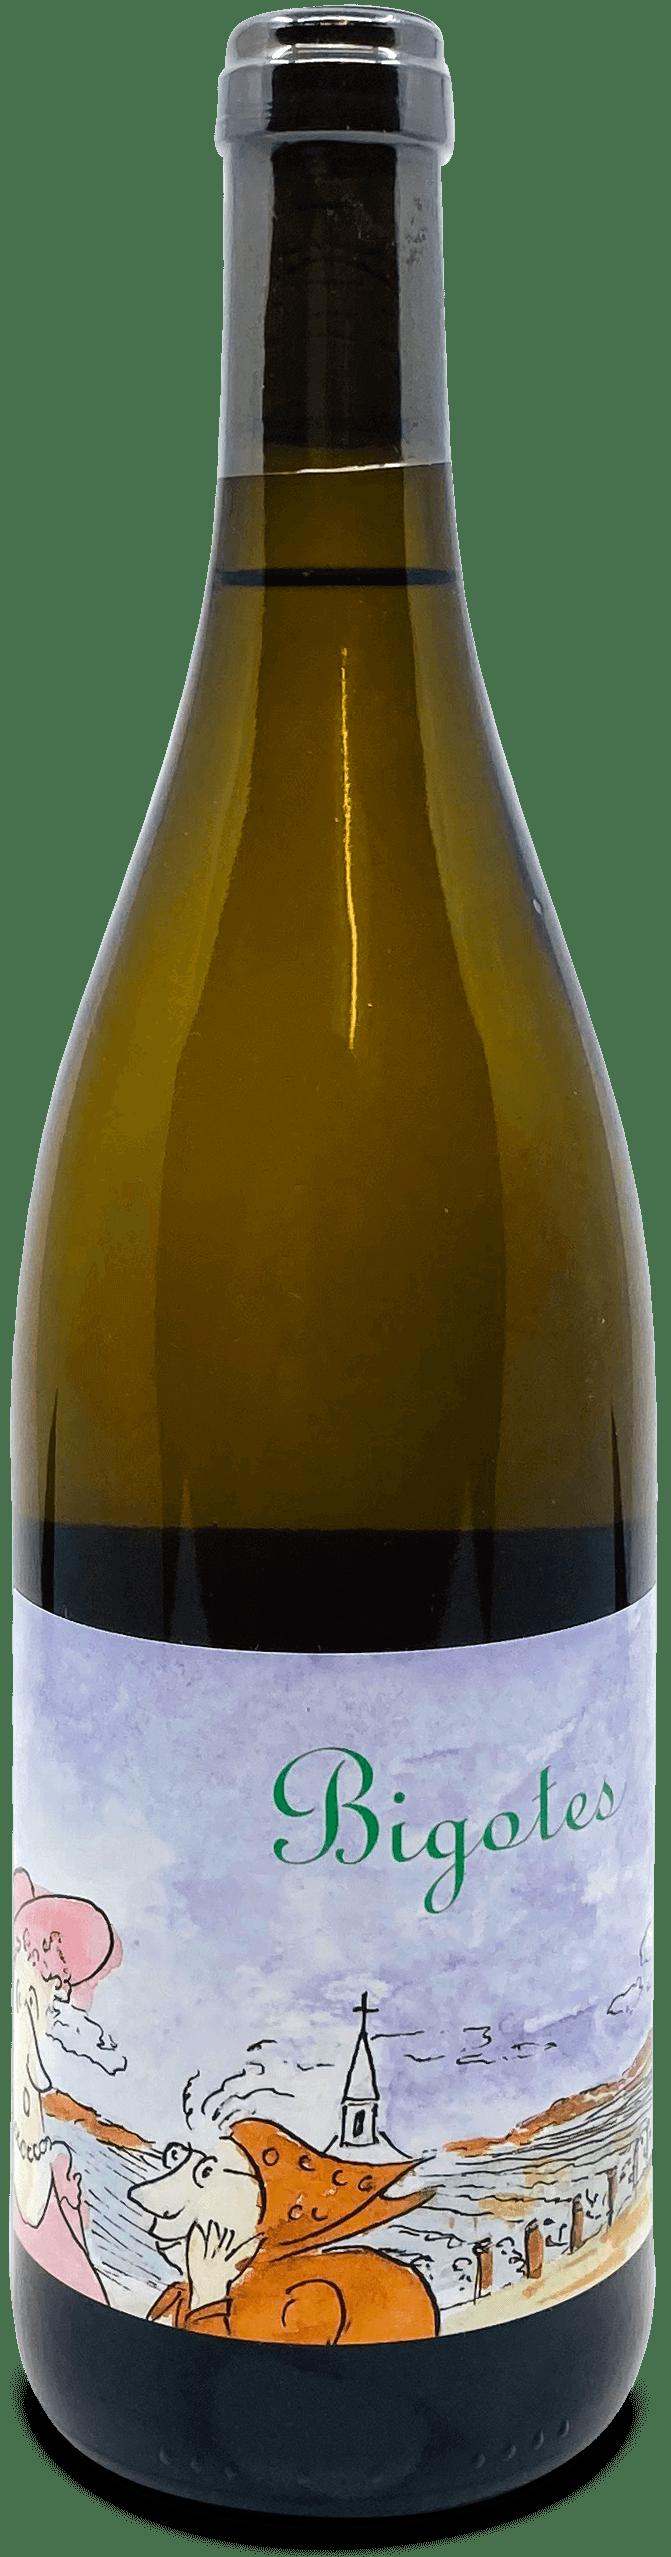 Bourgogne Blanc Bigotes - Vinsupernaturel